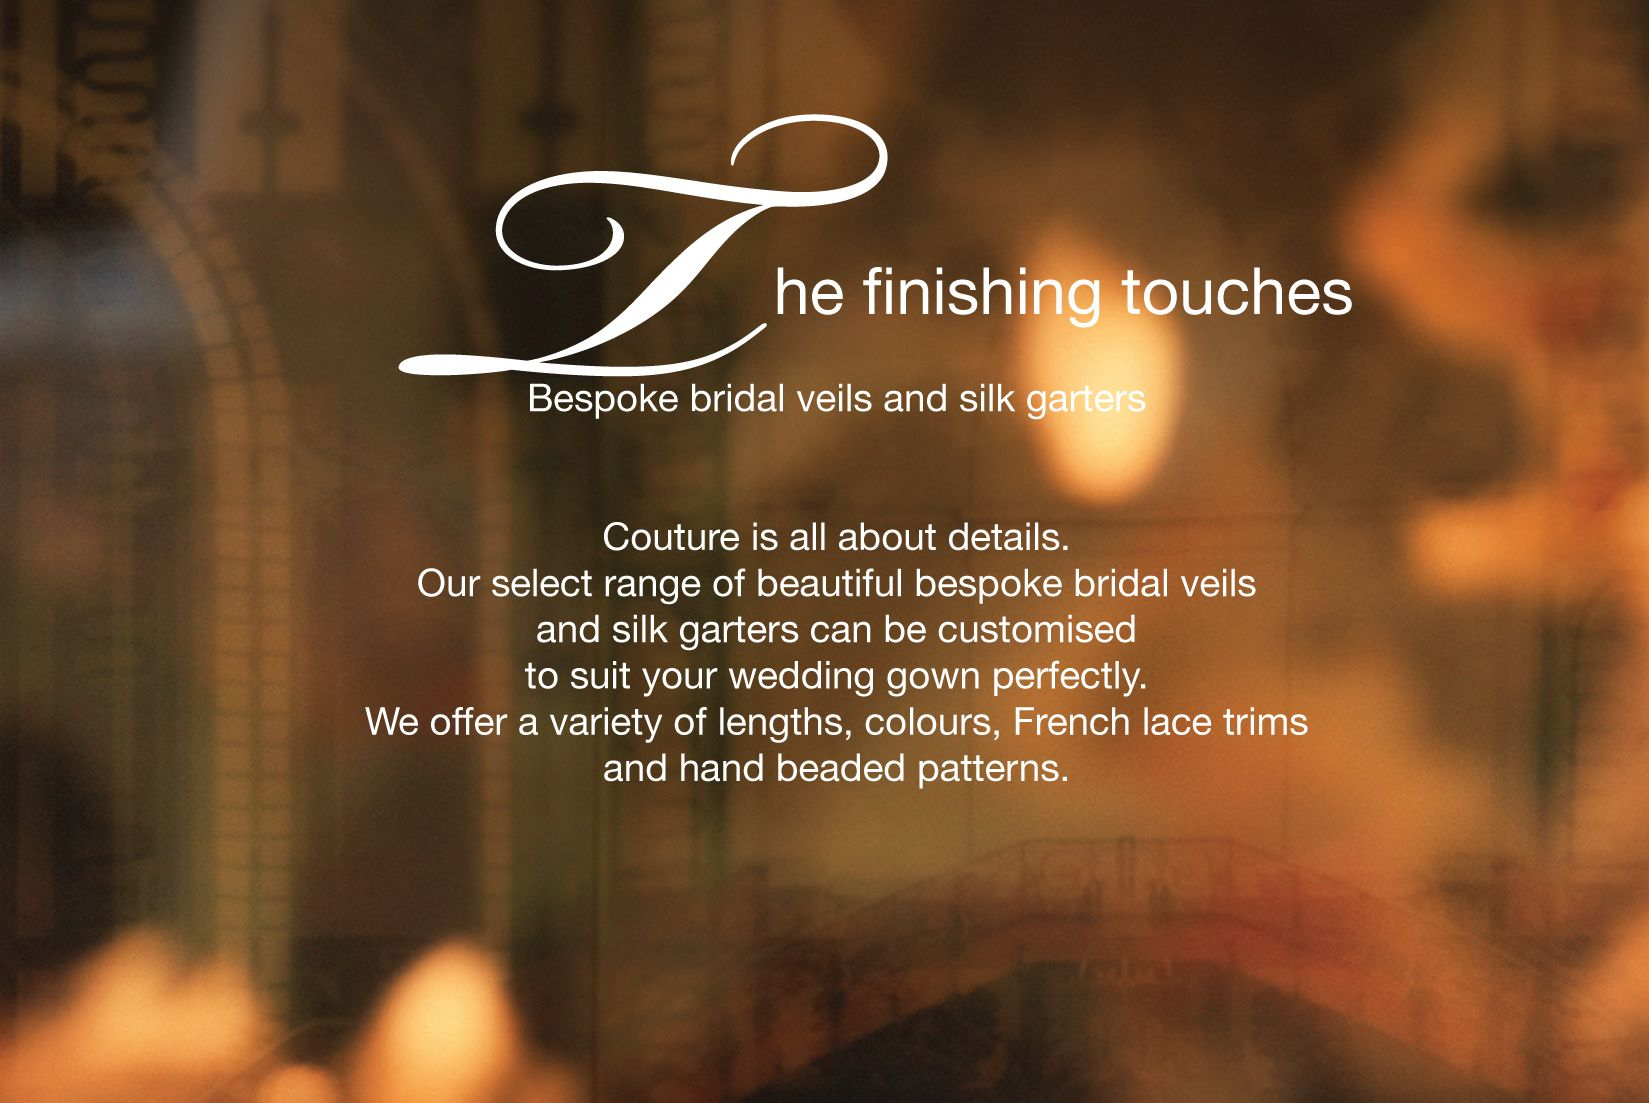 Bespoke bridal veils and delicate silk garters